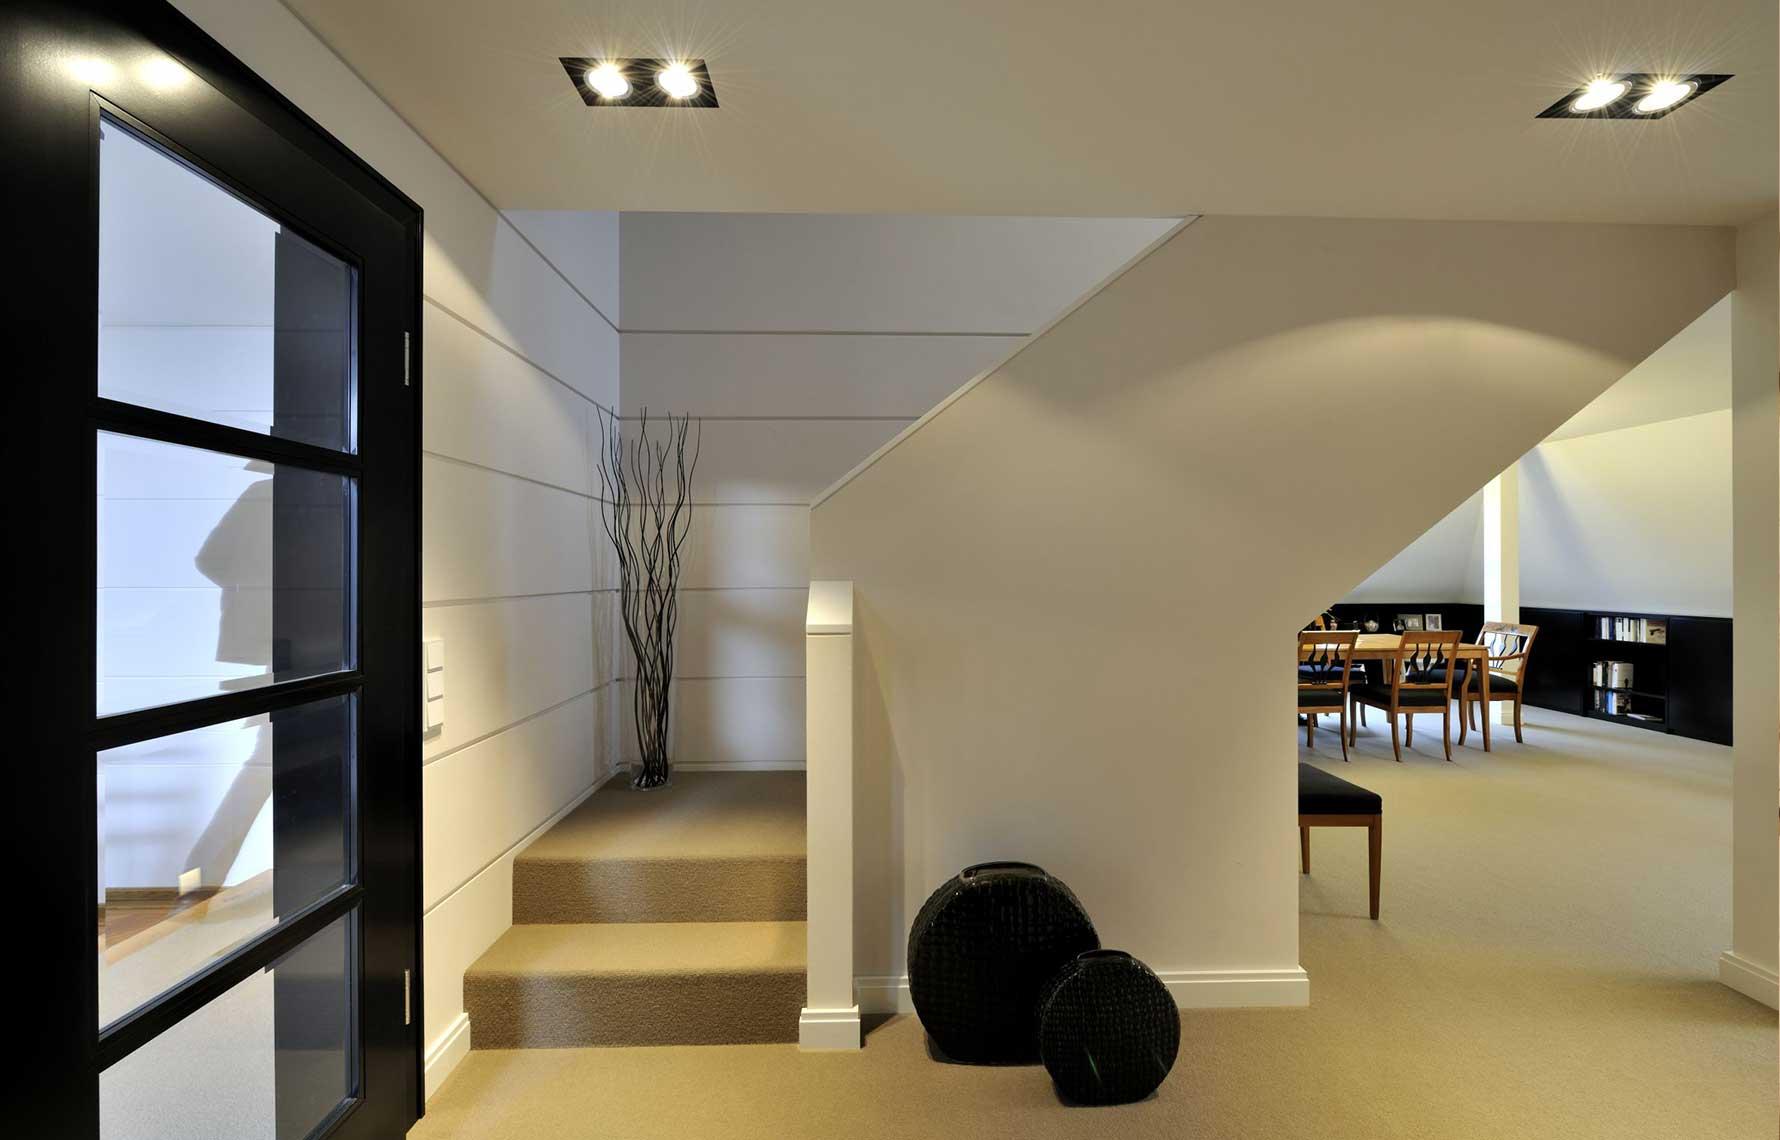 Referenzen - Joachim Wagner Interior Design